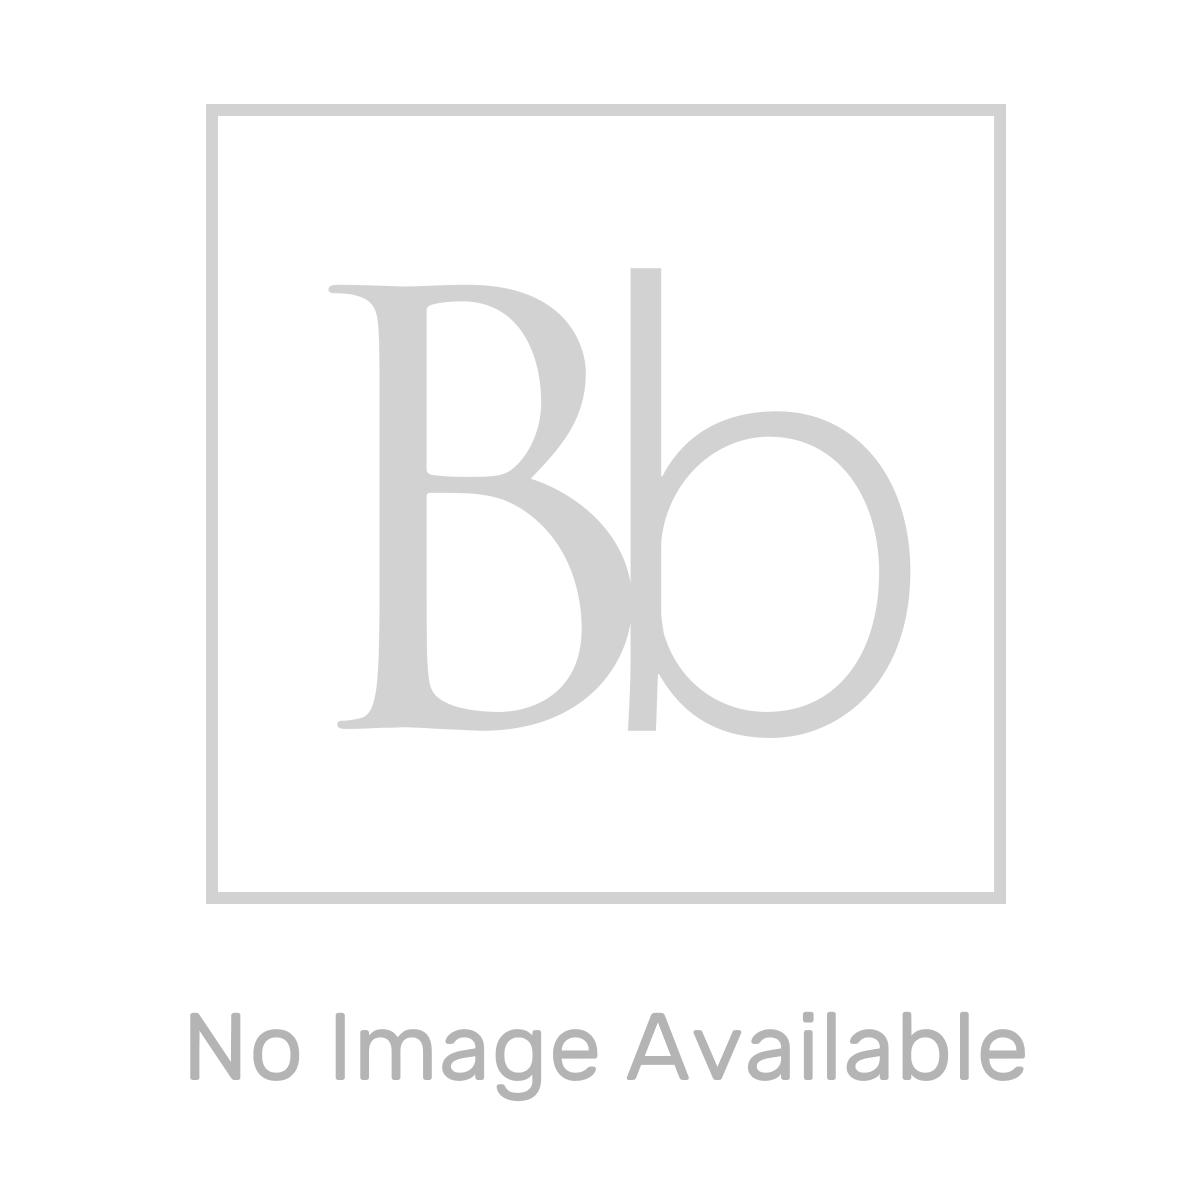 Tavistock Quantum Thermostatic Shower System with Accessory Shelf and Shower Head